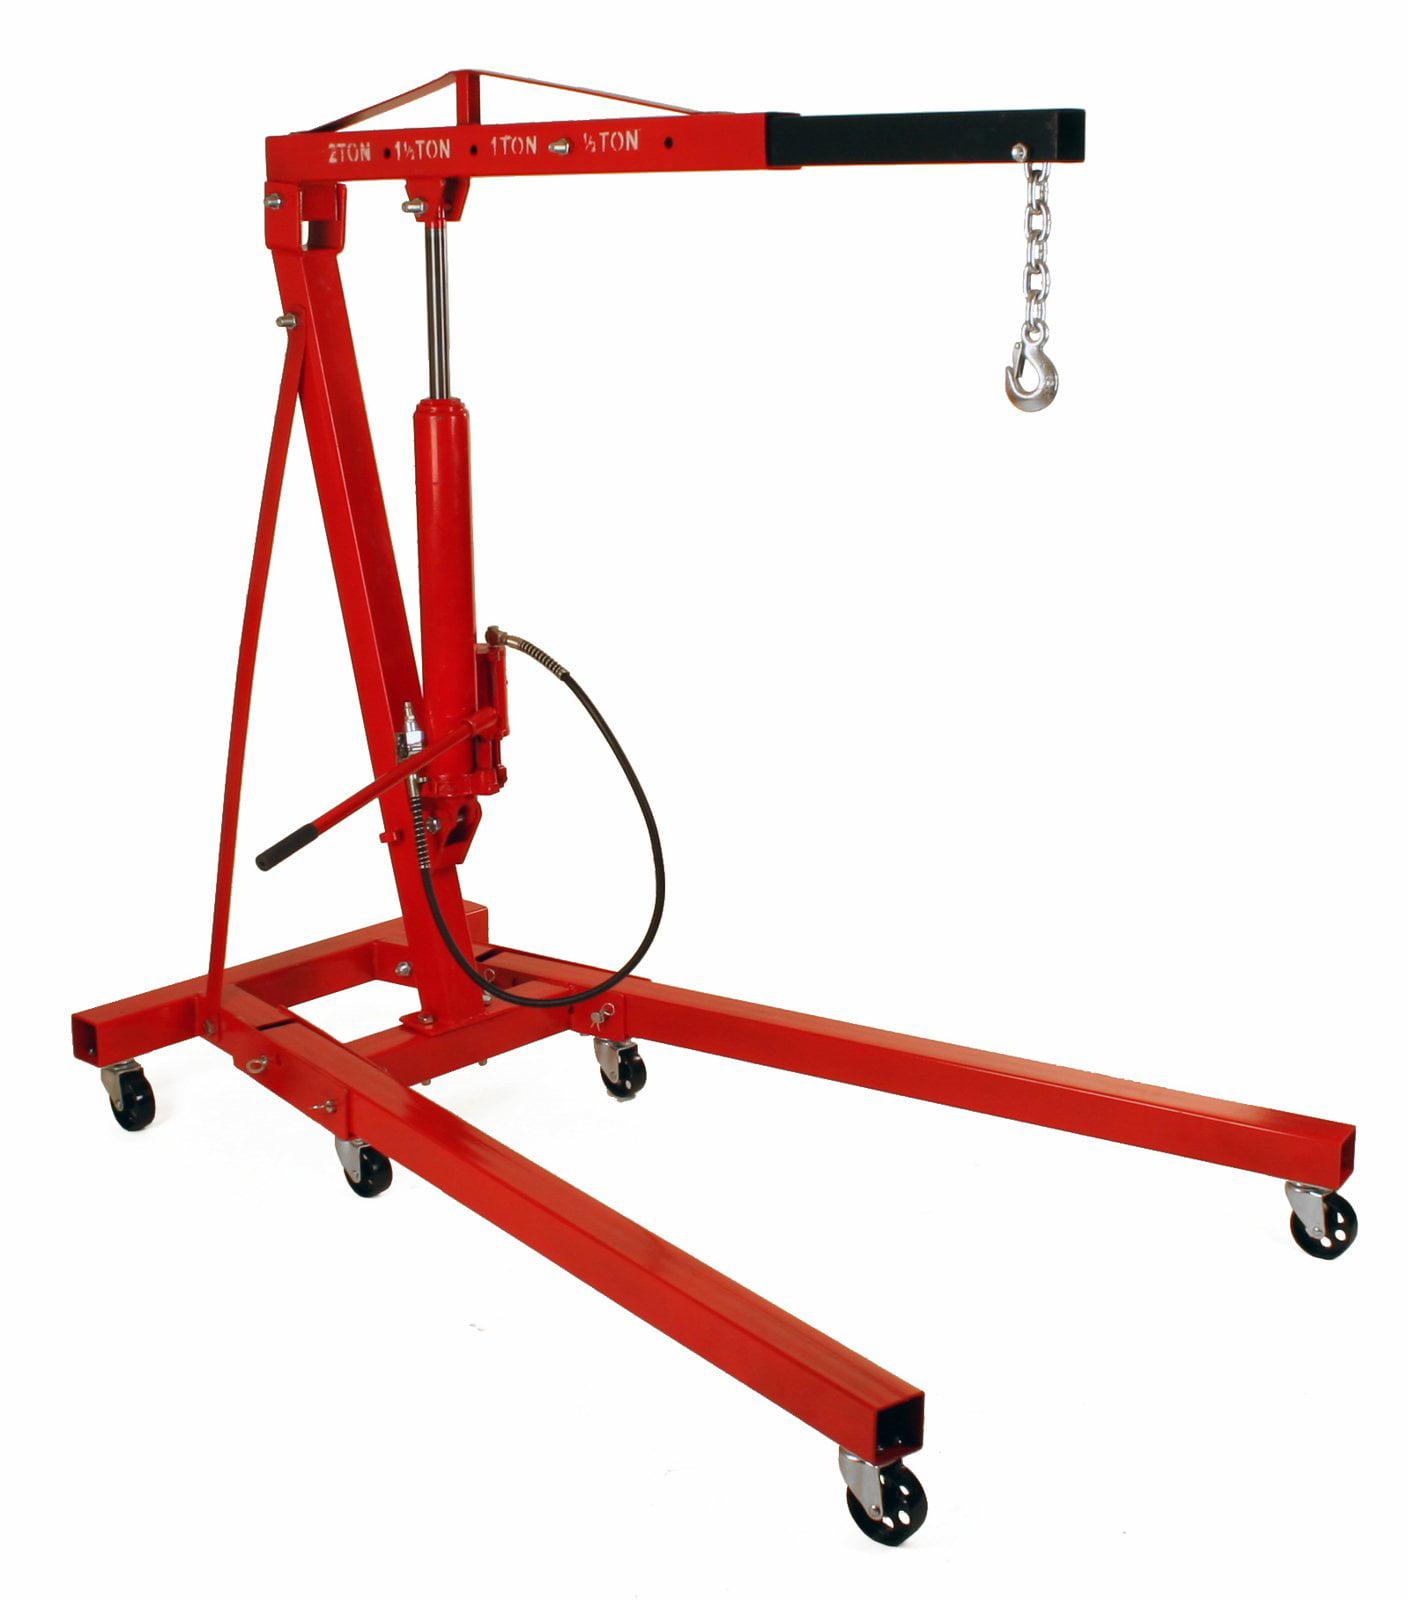 Dragway Tools 2 Ton Folding Air Hydraulic Engine Hoist Cherry Picker Shop Crane Hoist Lift by Dragway Tools